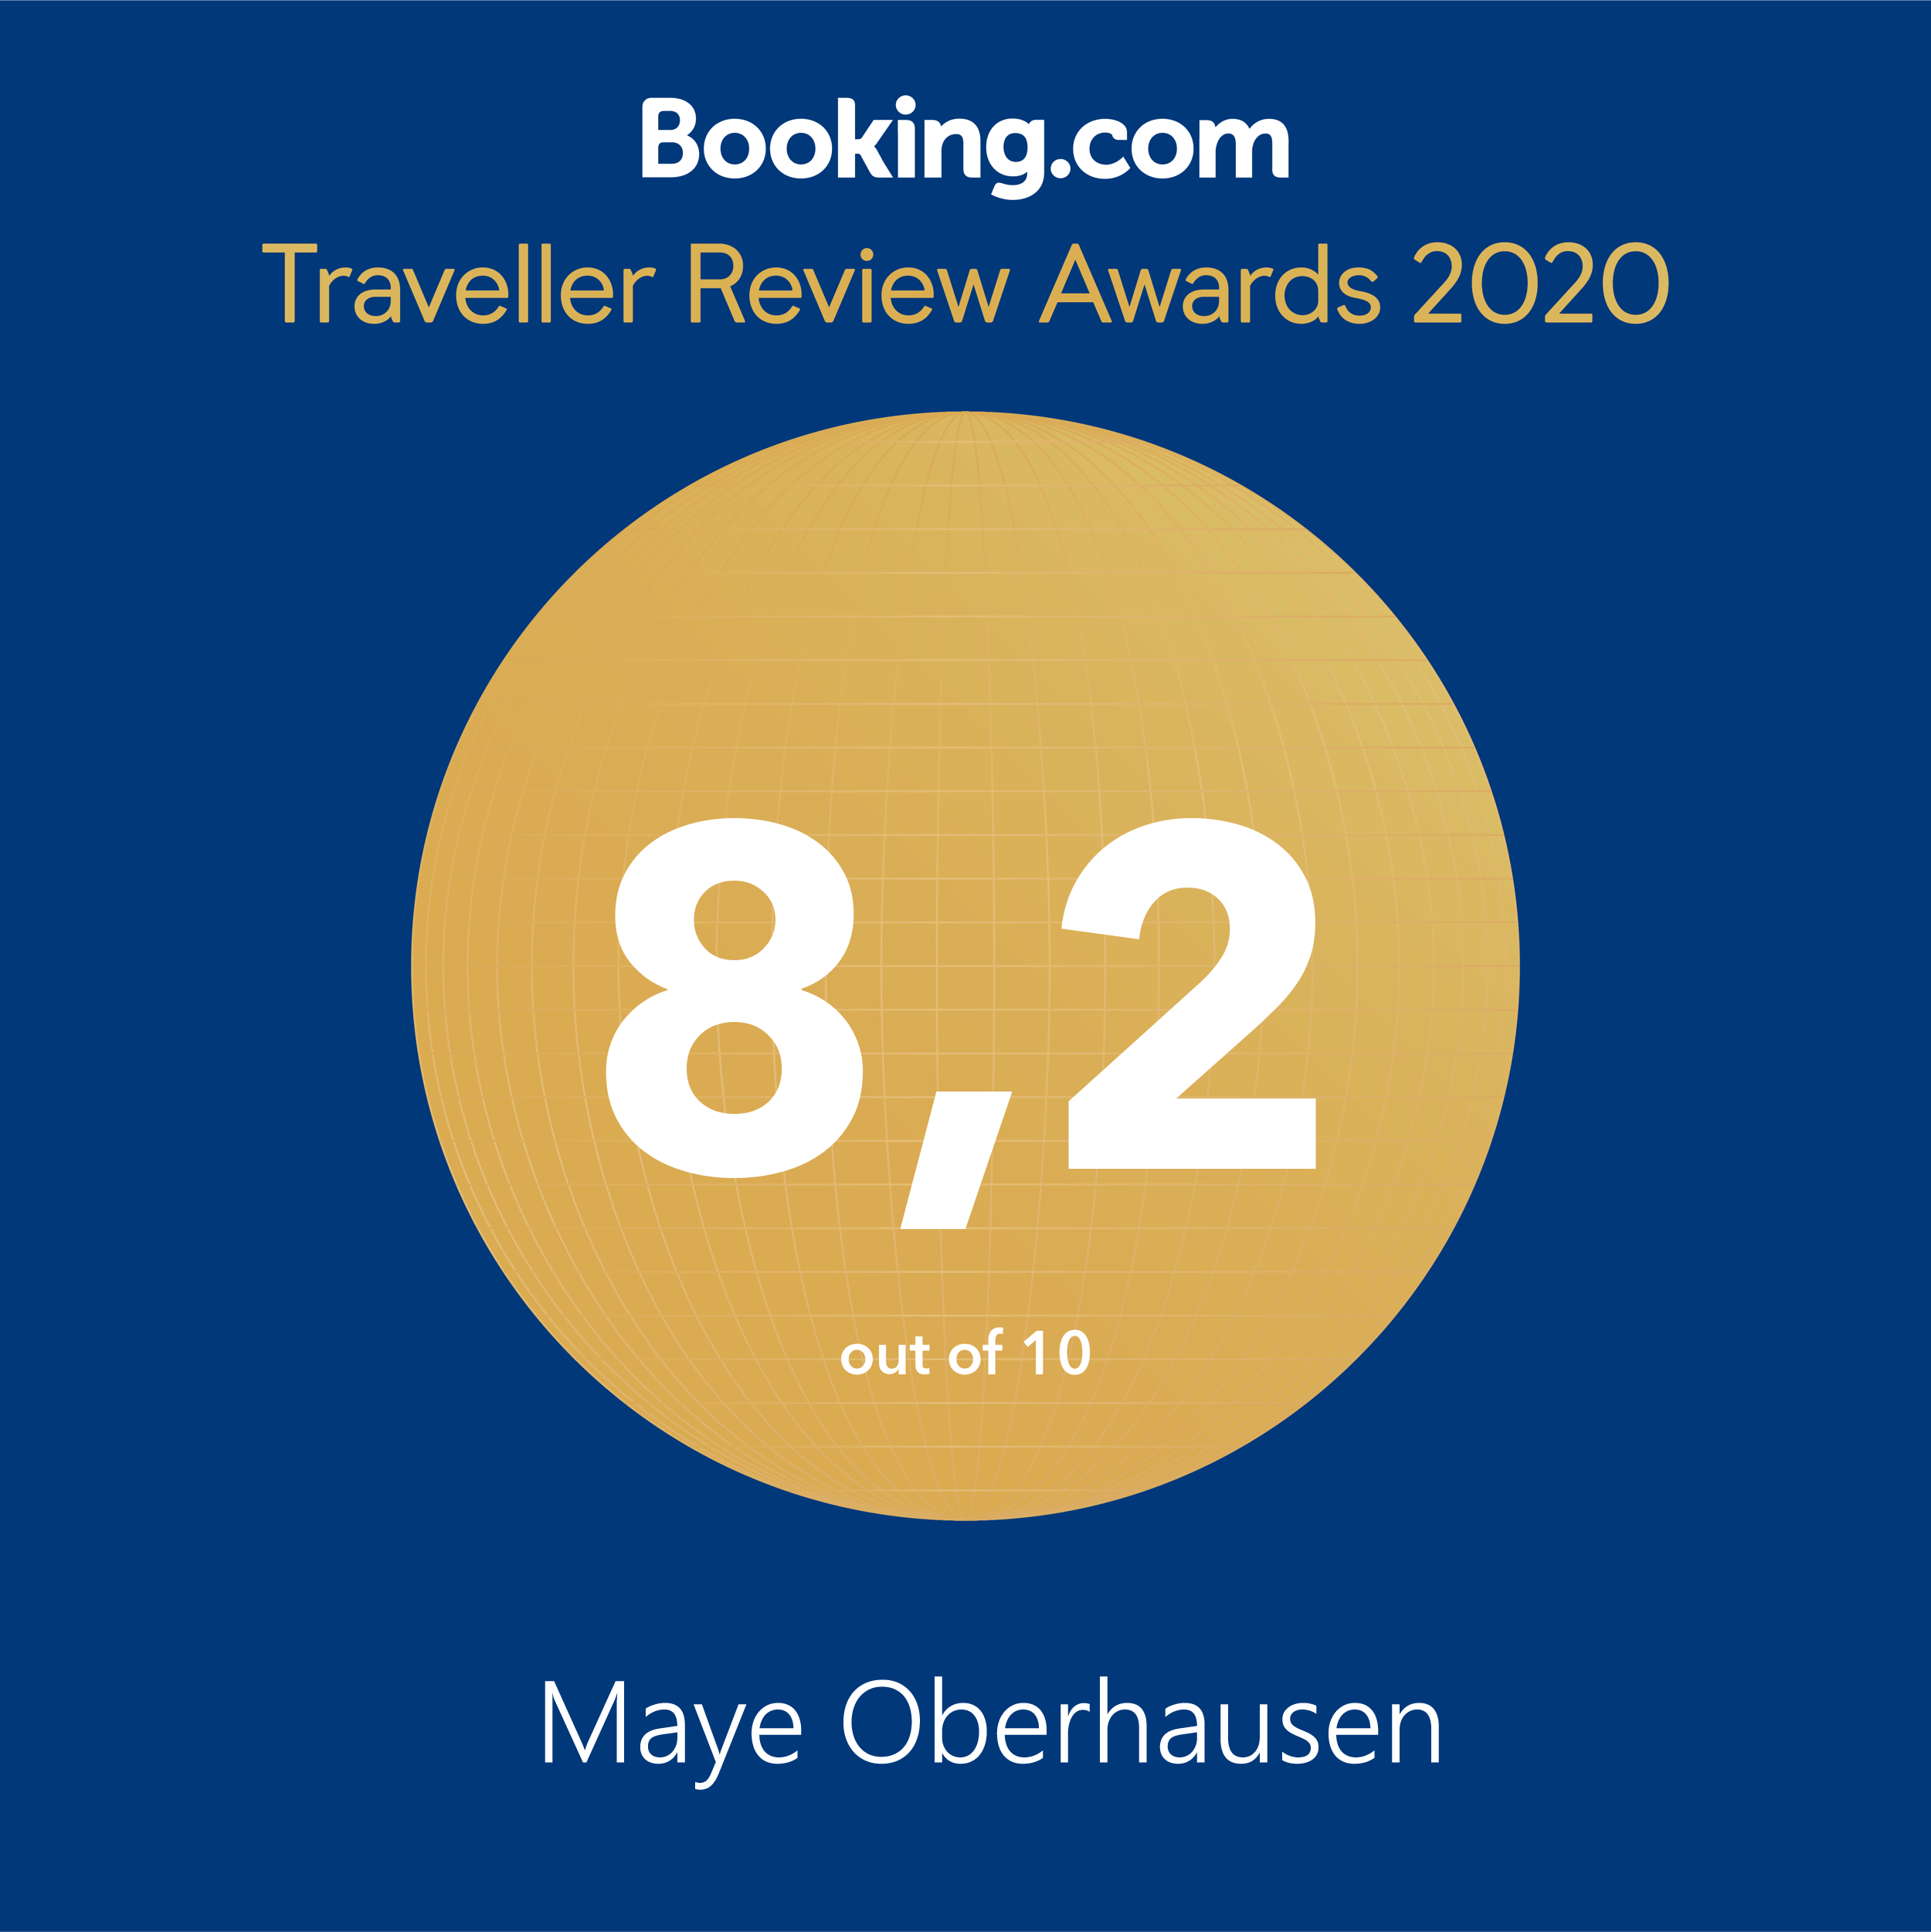 Booking.com Award 2020 Maye Oberhausen